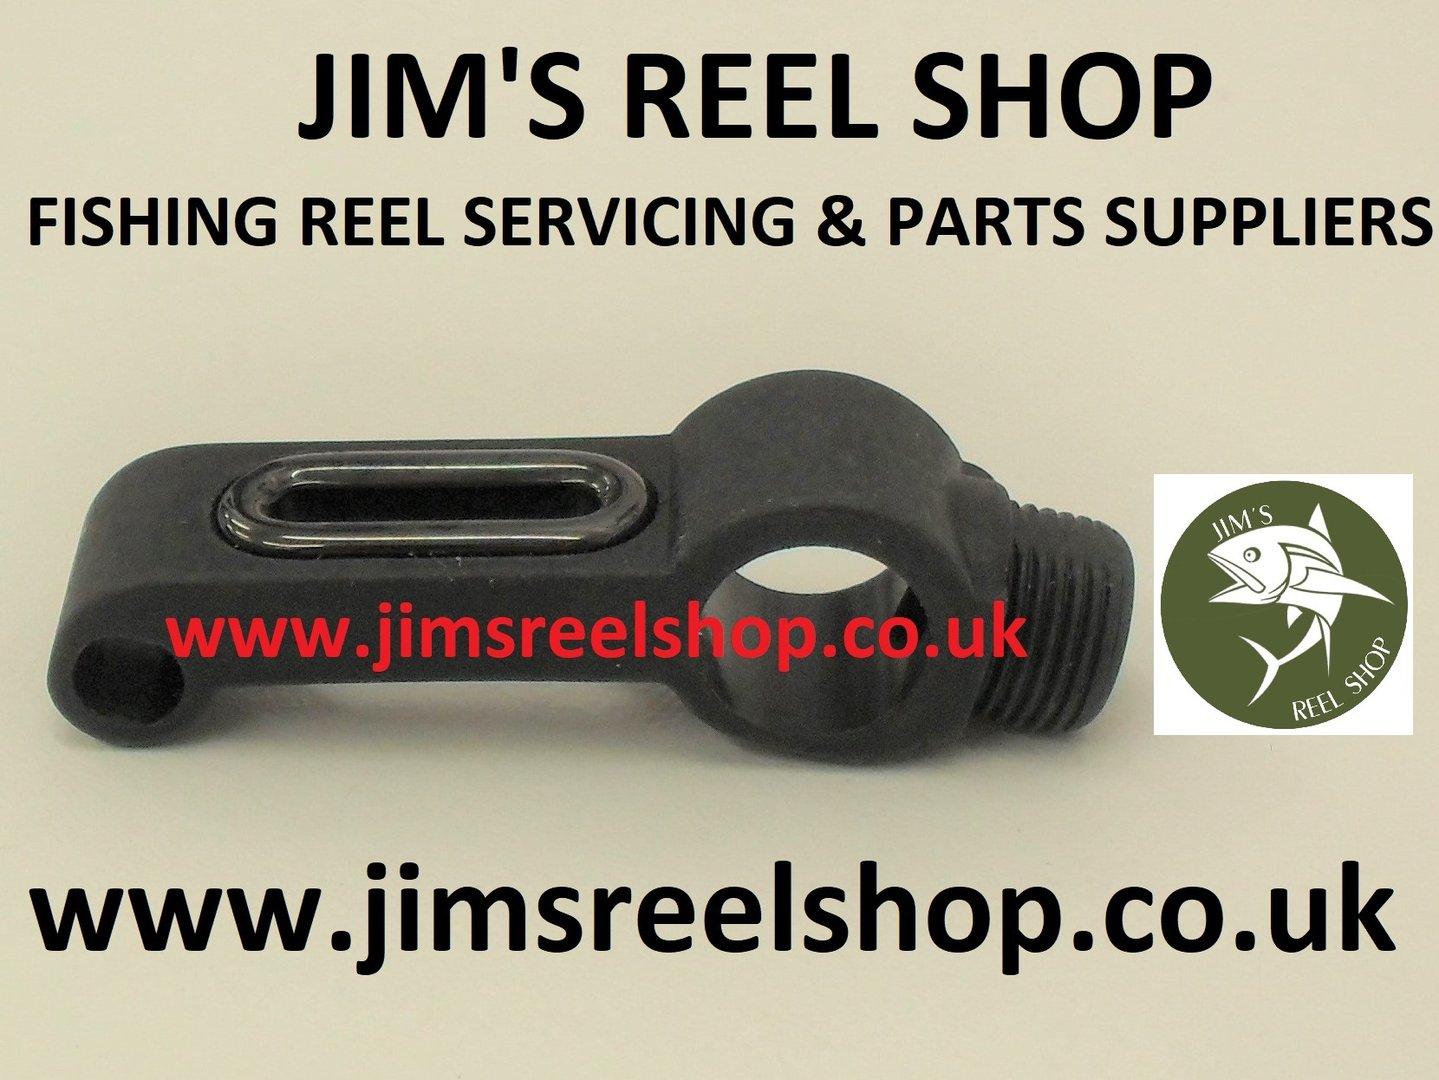 0ab74a61c5f DAIWA SALTIST LEVEL-WIND LINE GUIDES # E57-3101 - Jim's Reel Shop